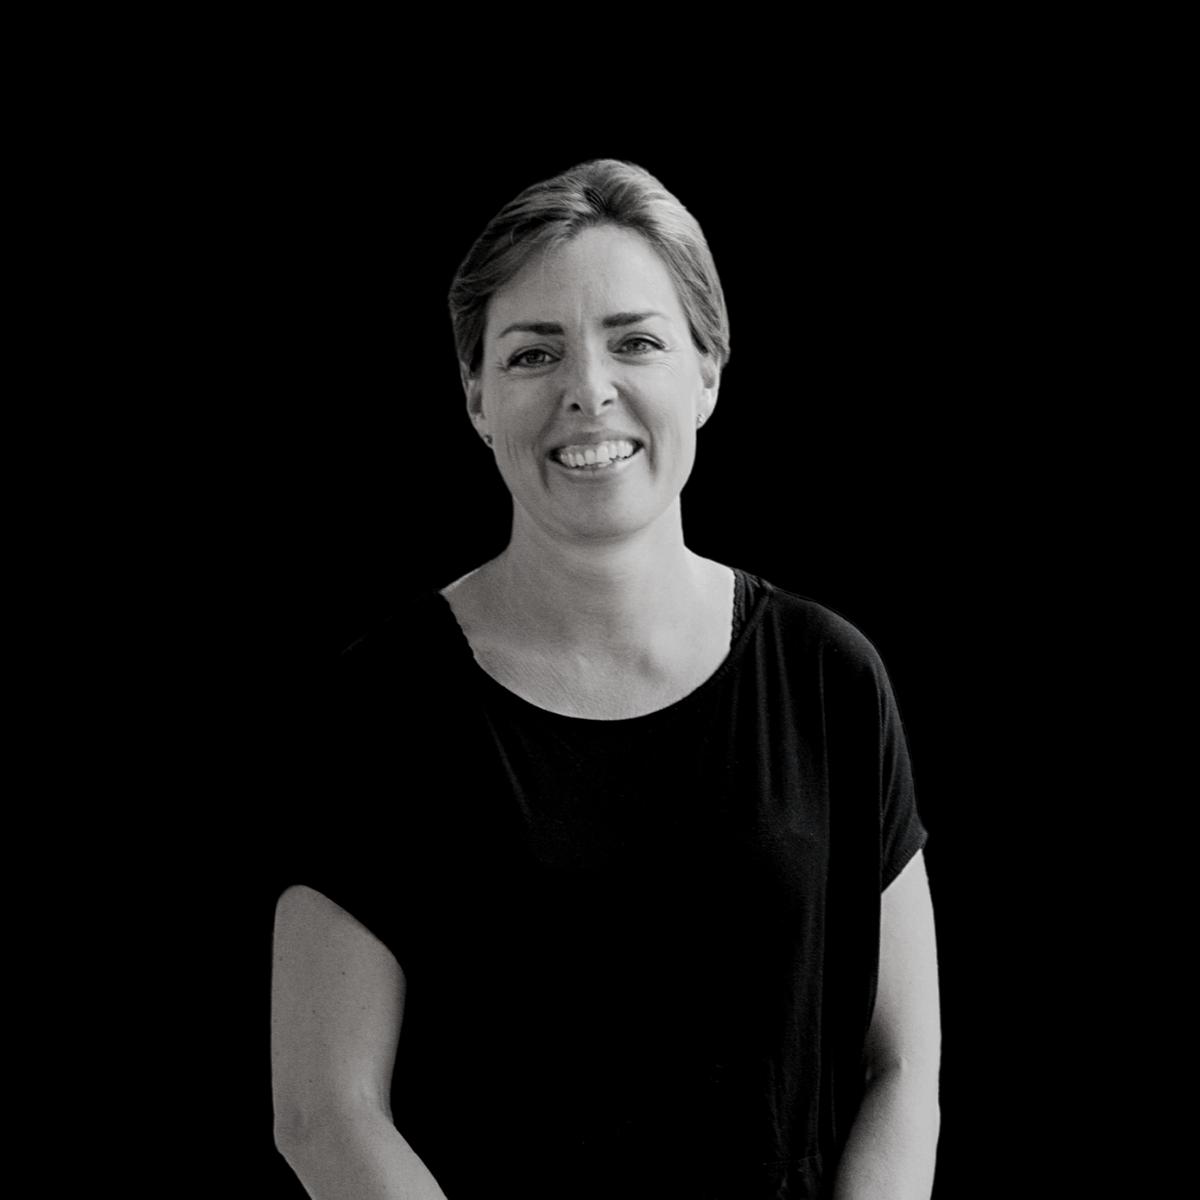 Susanna Sonander | Social Impact